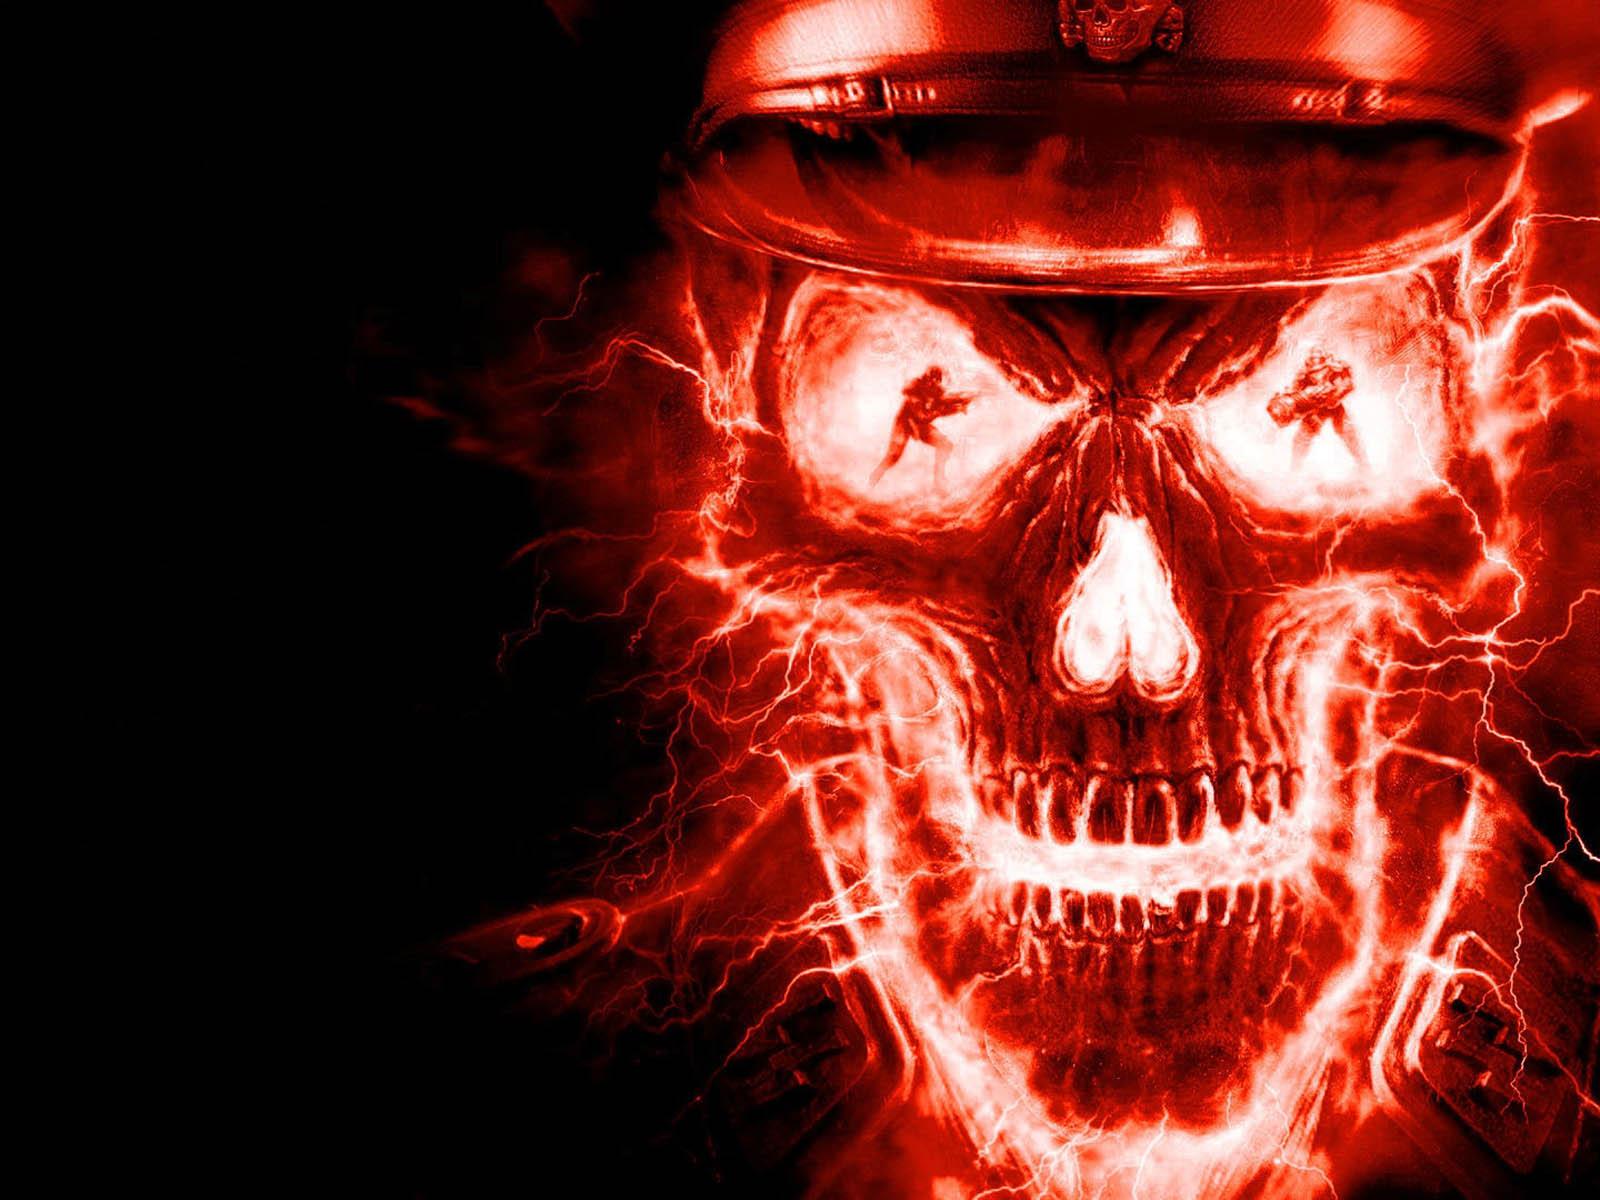 wallpapers skull desktop - photo #9